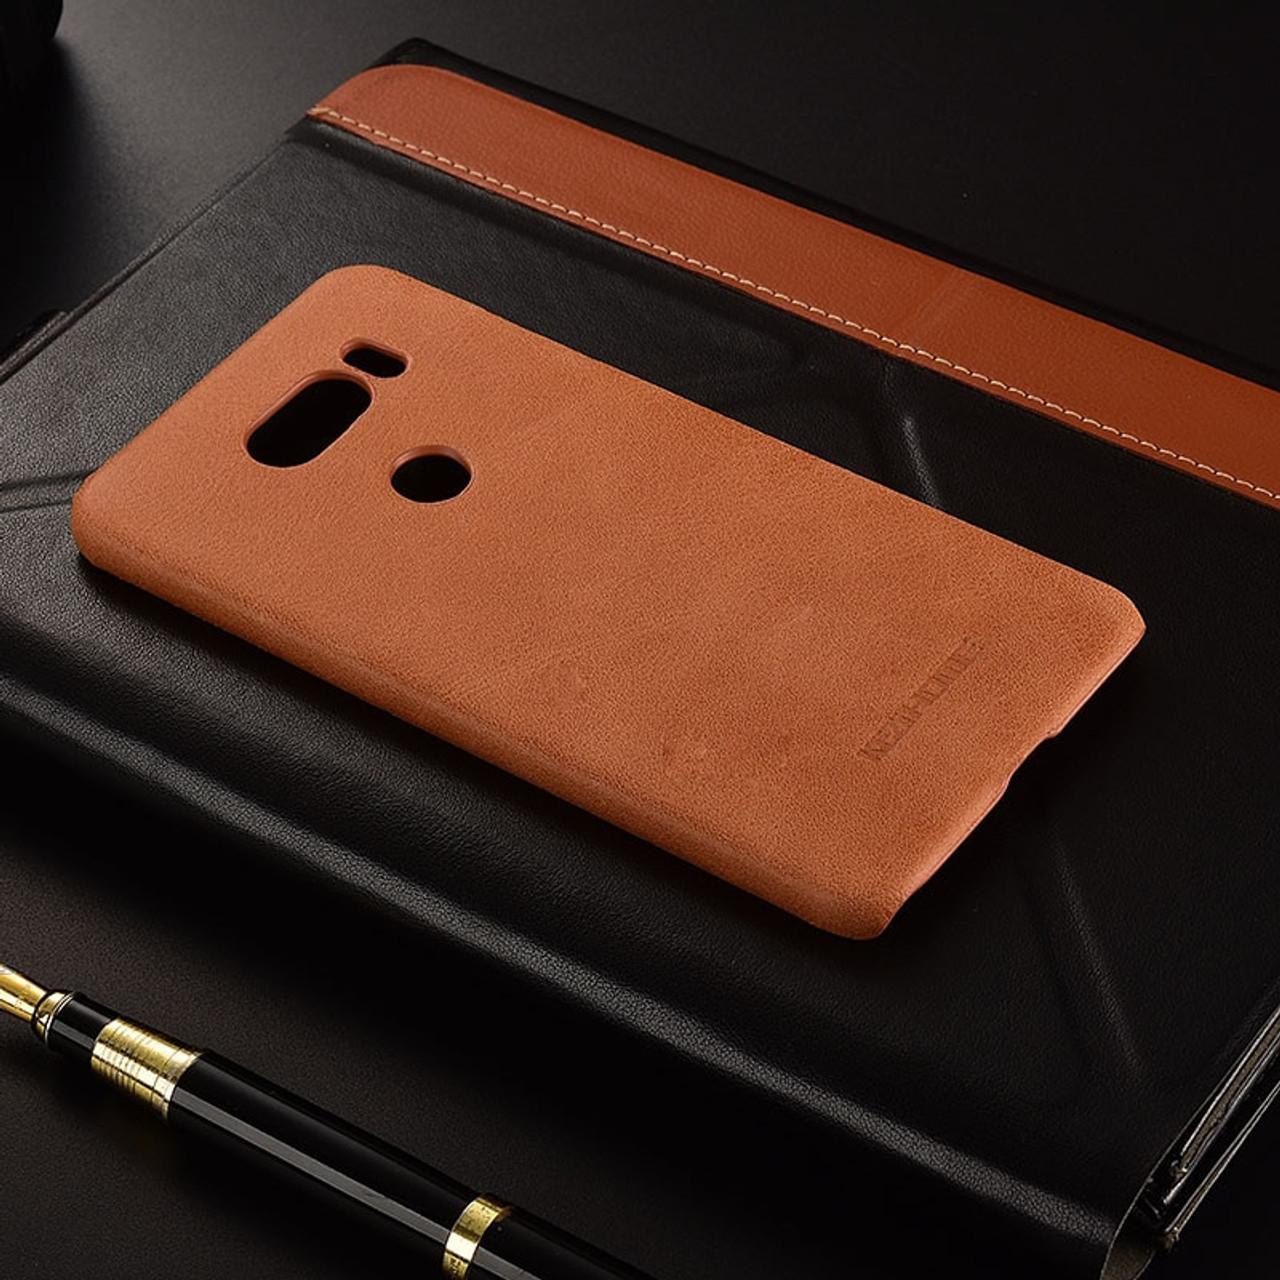 new style 224ef 959d6 for LG V30 / V30 Plus case KEZiHOME Frosted Genuine Leather Hard Back Cover  capa For LG V30 V30+ 6.0'' Phone cases